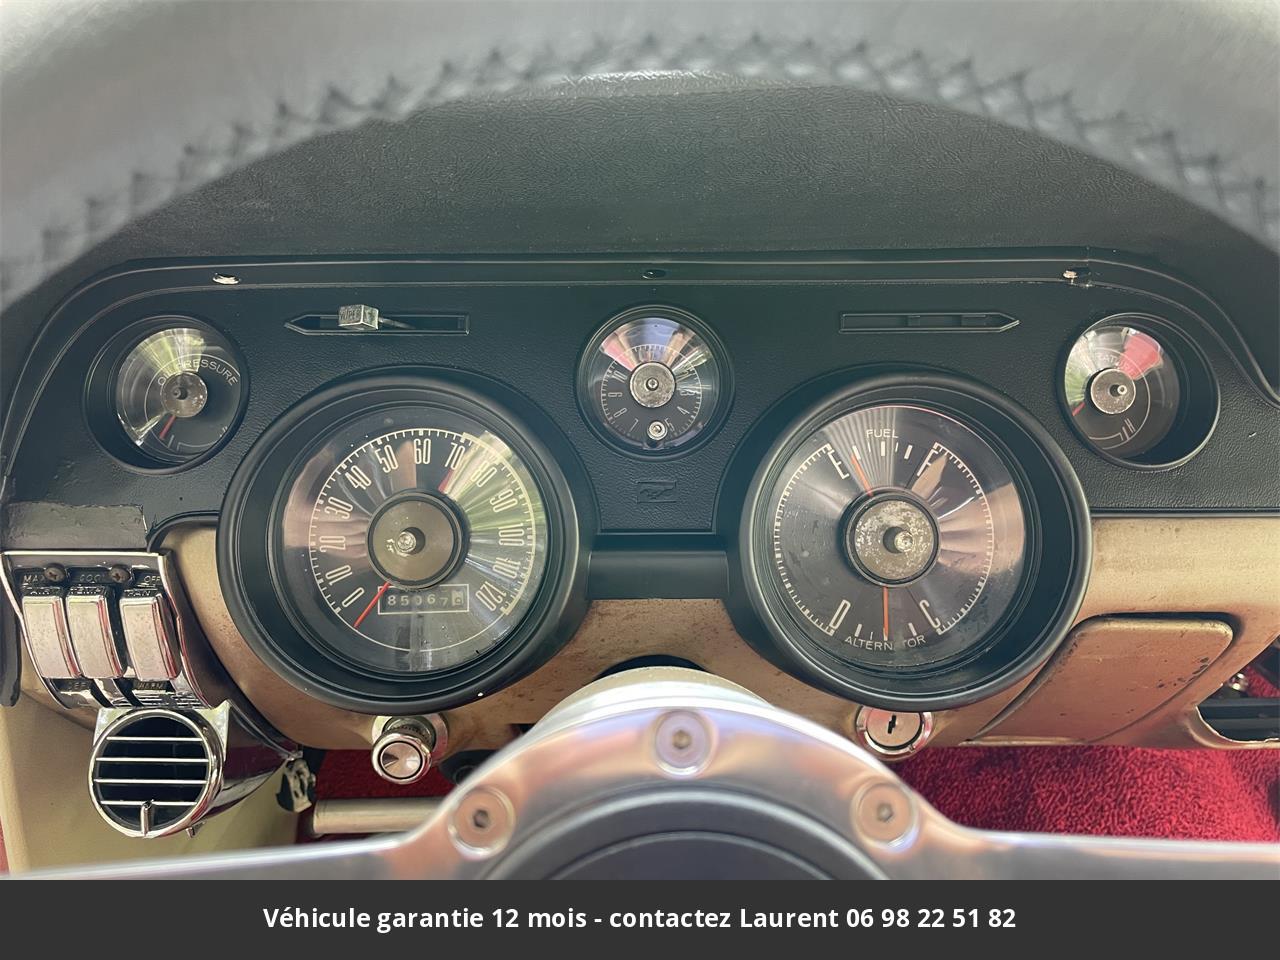 Ford Mustang 1968 prix tout compris